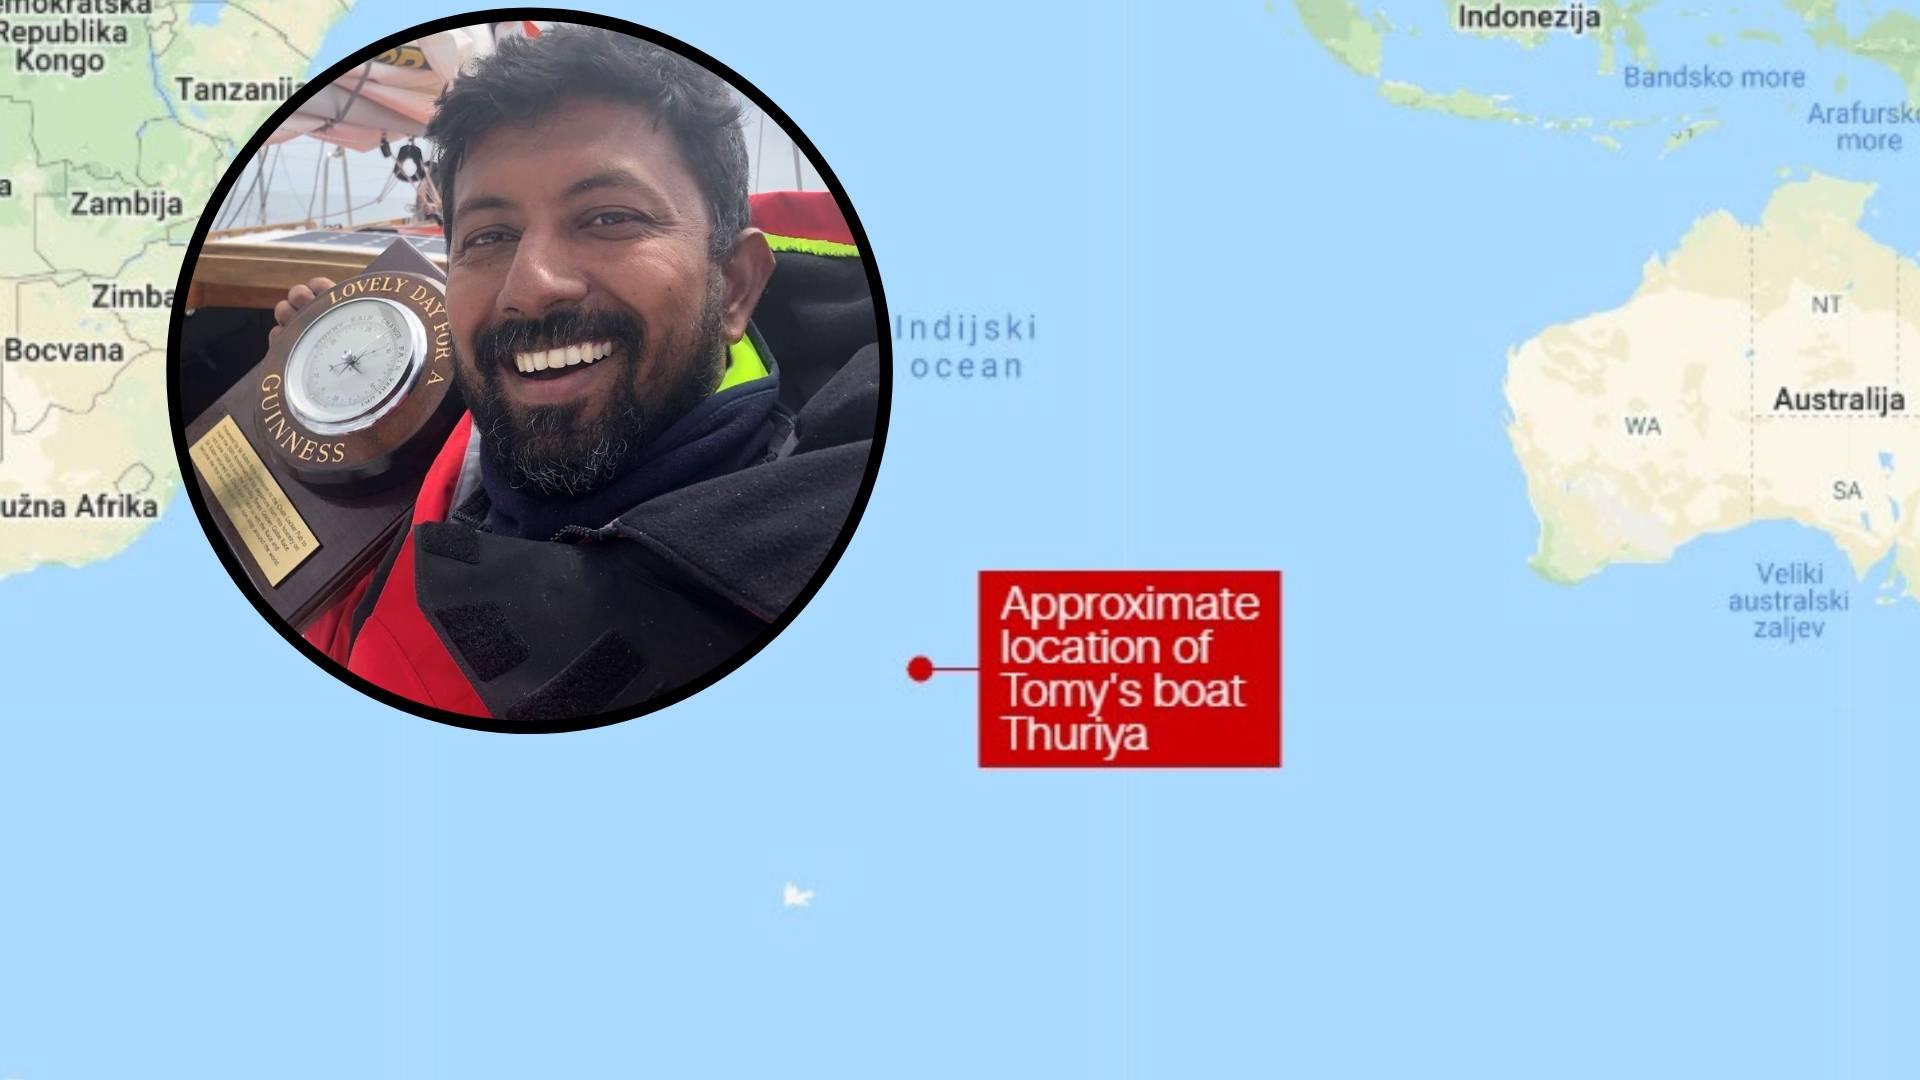 Bespomoćan pluta već 2 dana: 'Pomozite, ne mogu se micati'